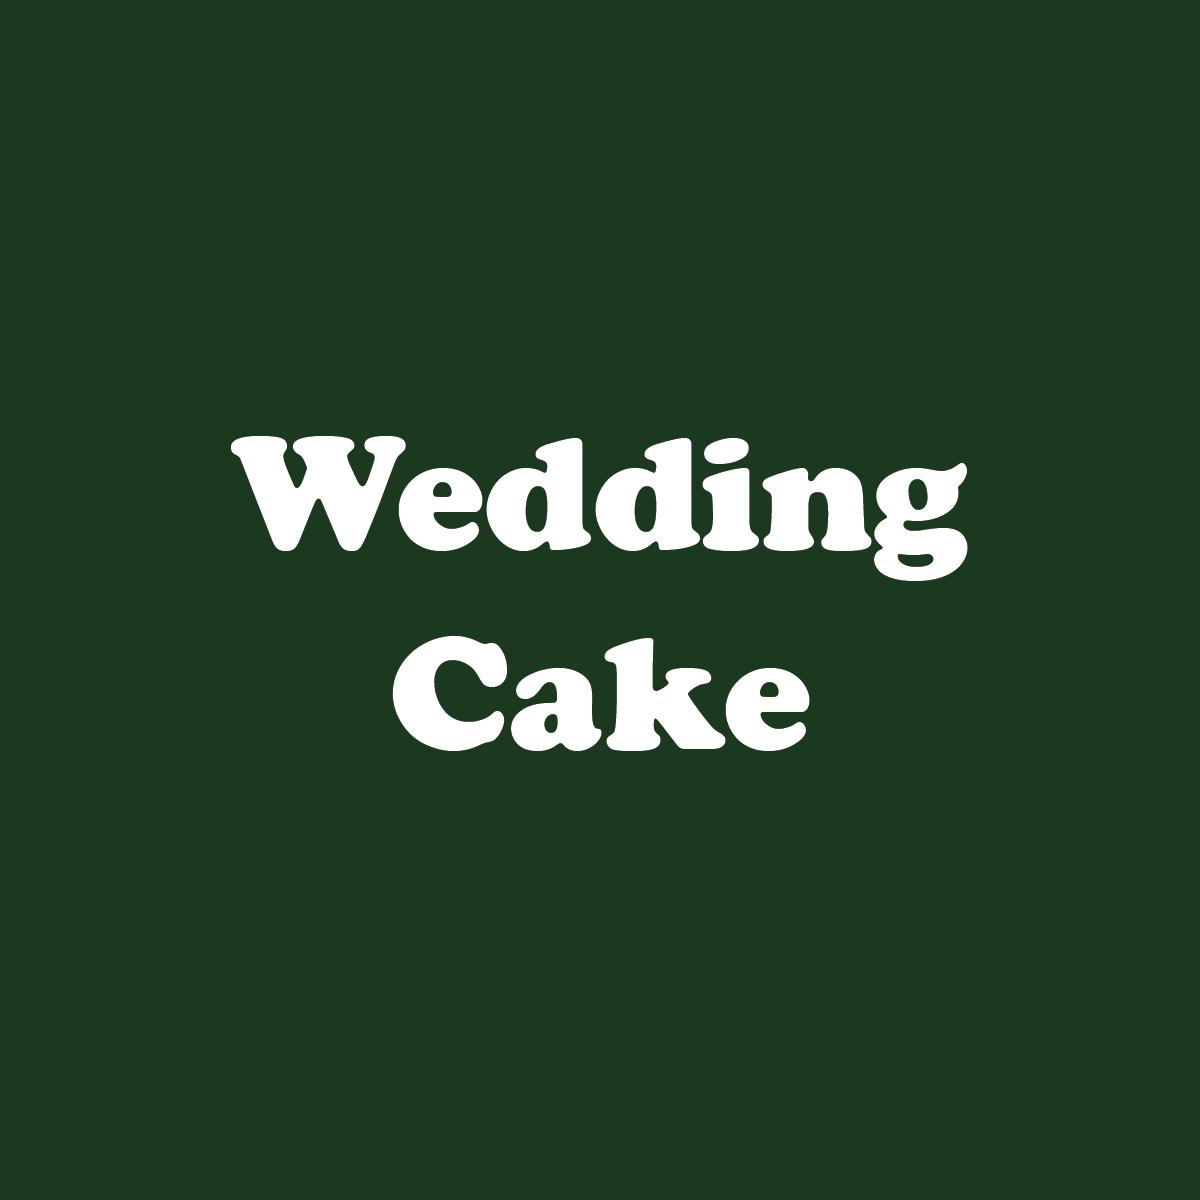 WeddingCake.png